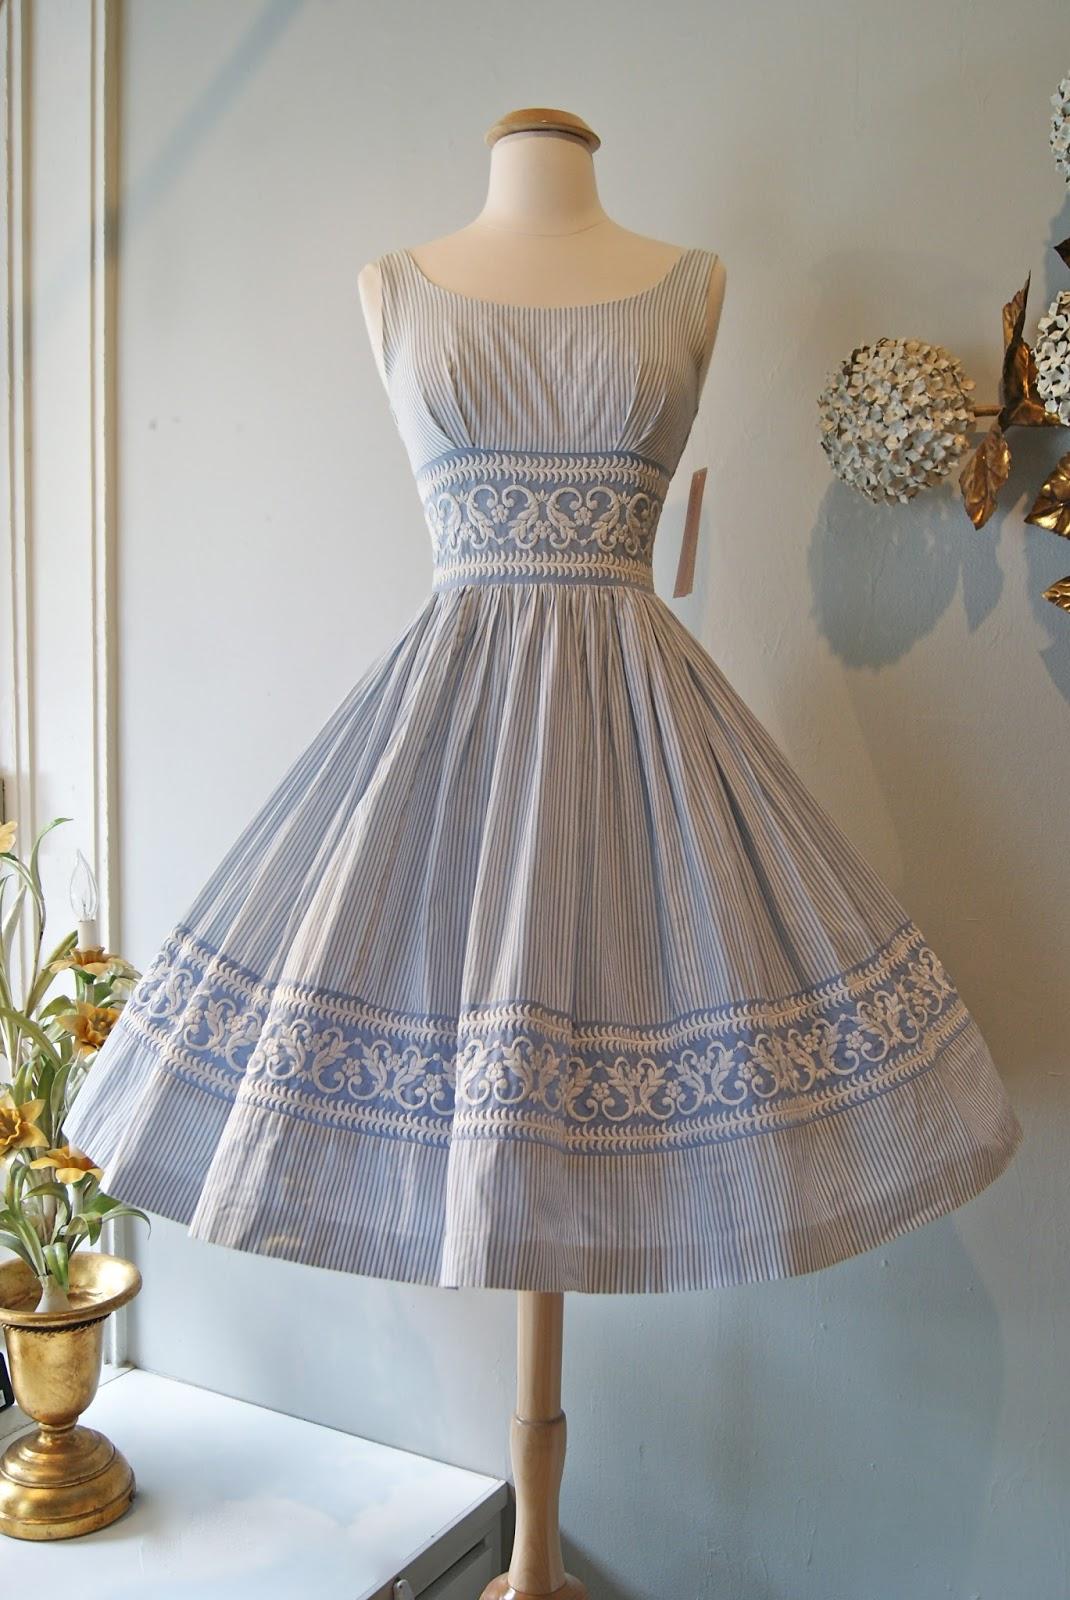 xtabay vintage clothing boutique portland oregon new